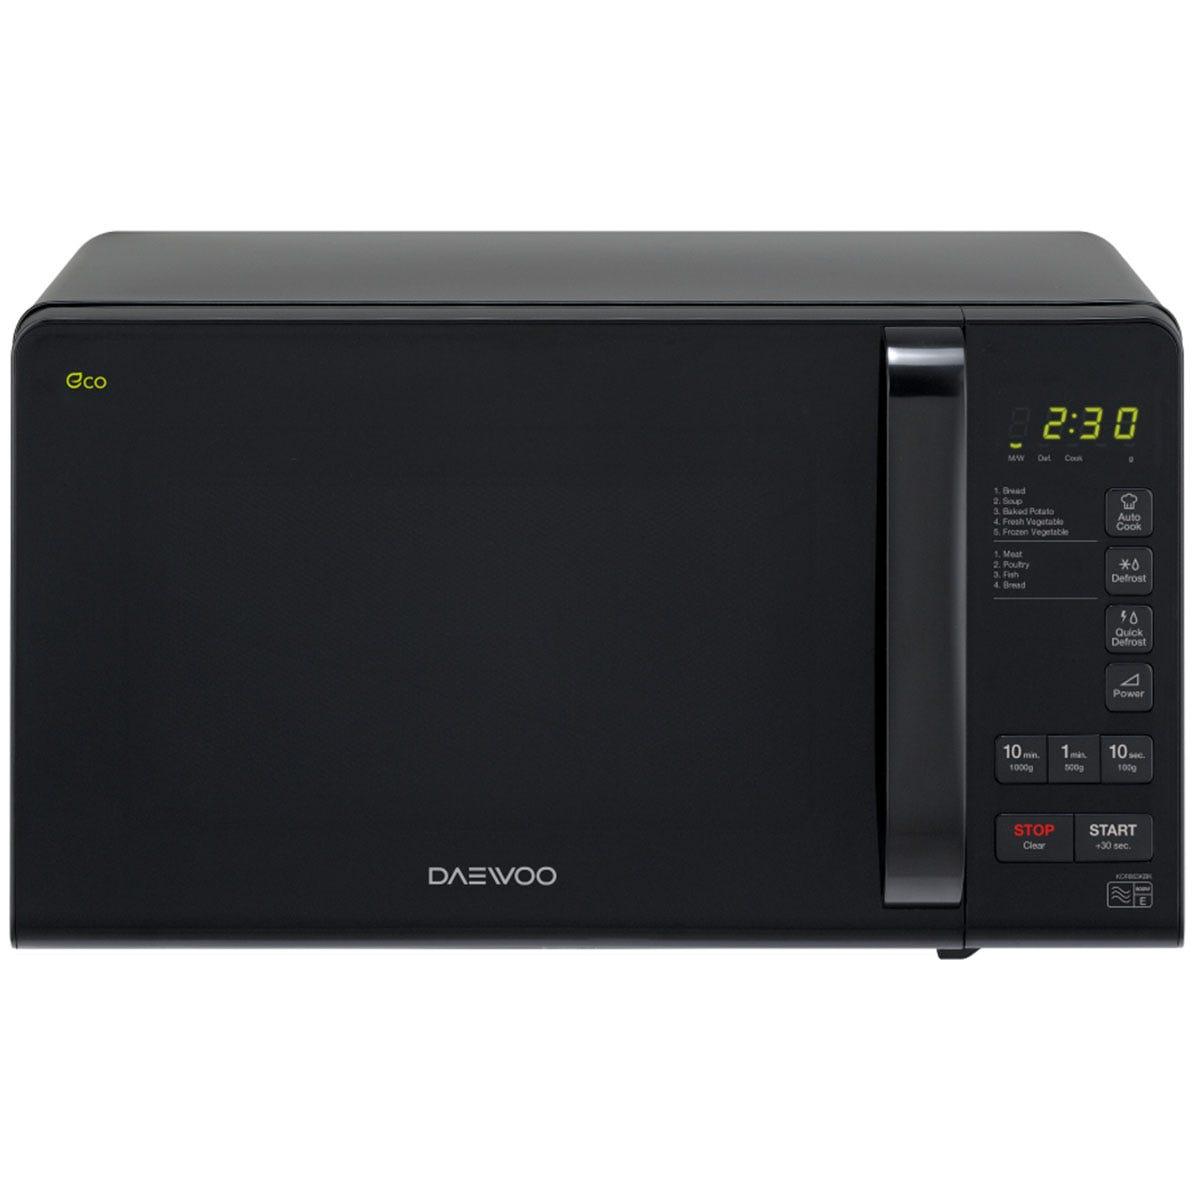 Daewoo KOR6M3RR 20L Touch Control 800W Digital Microwave - Black